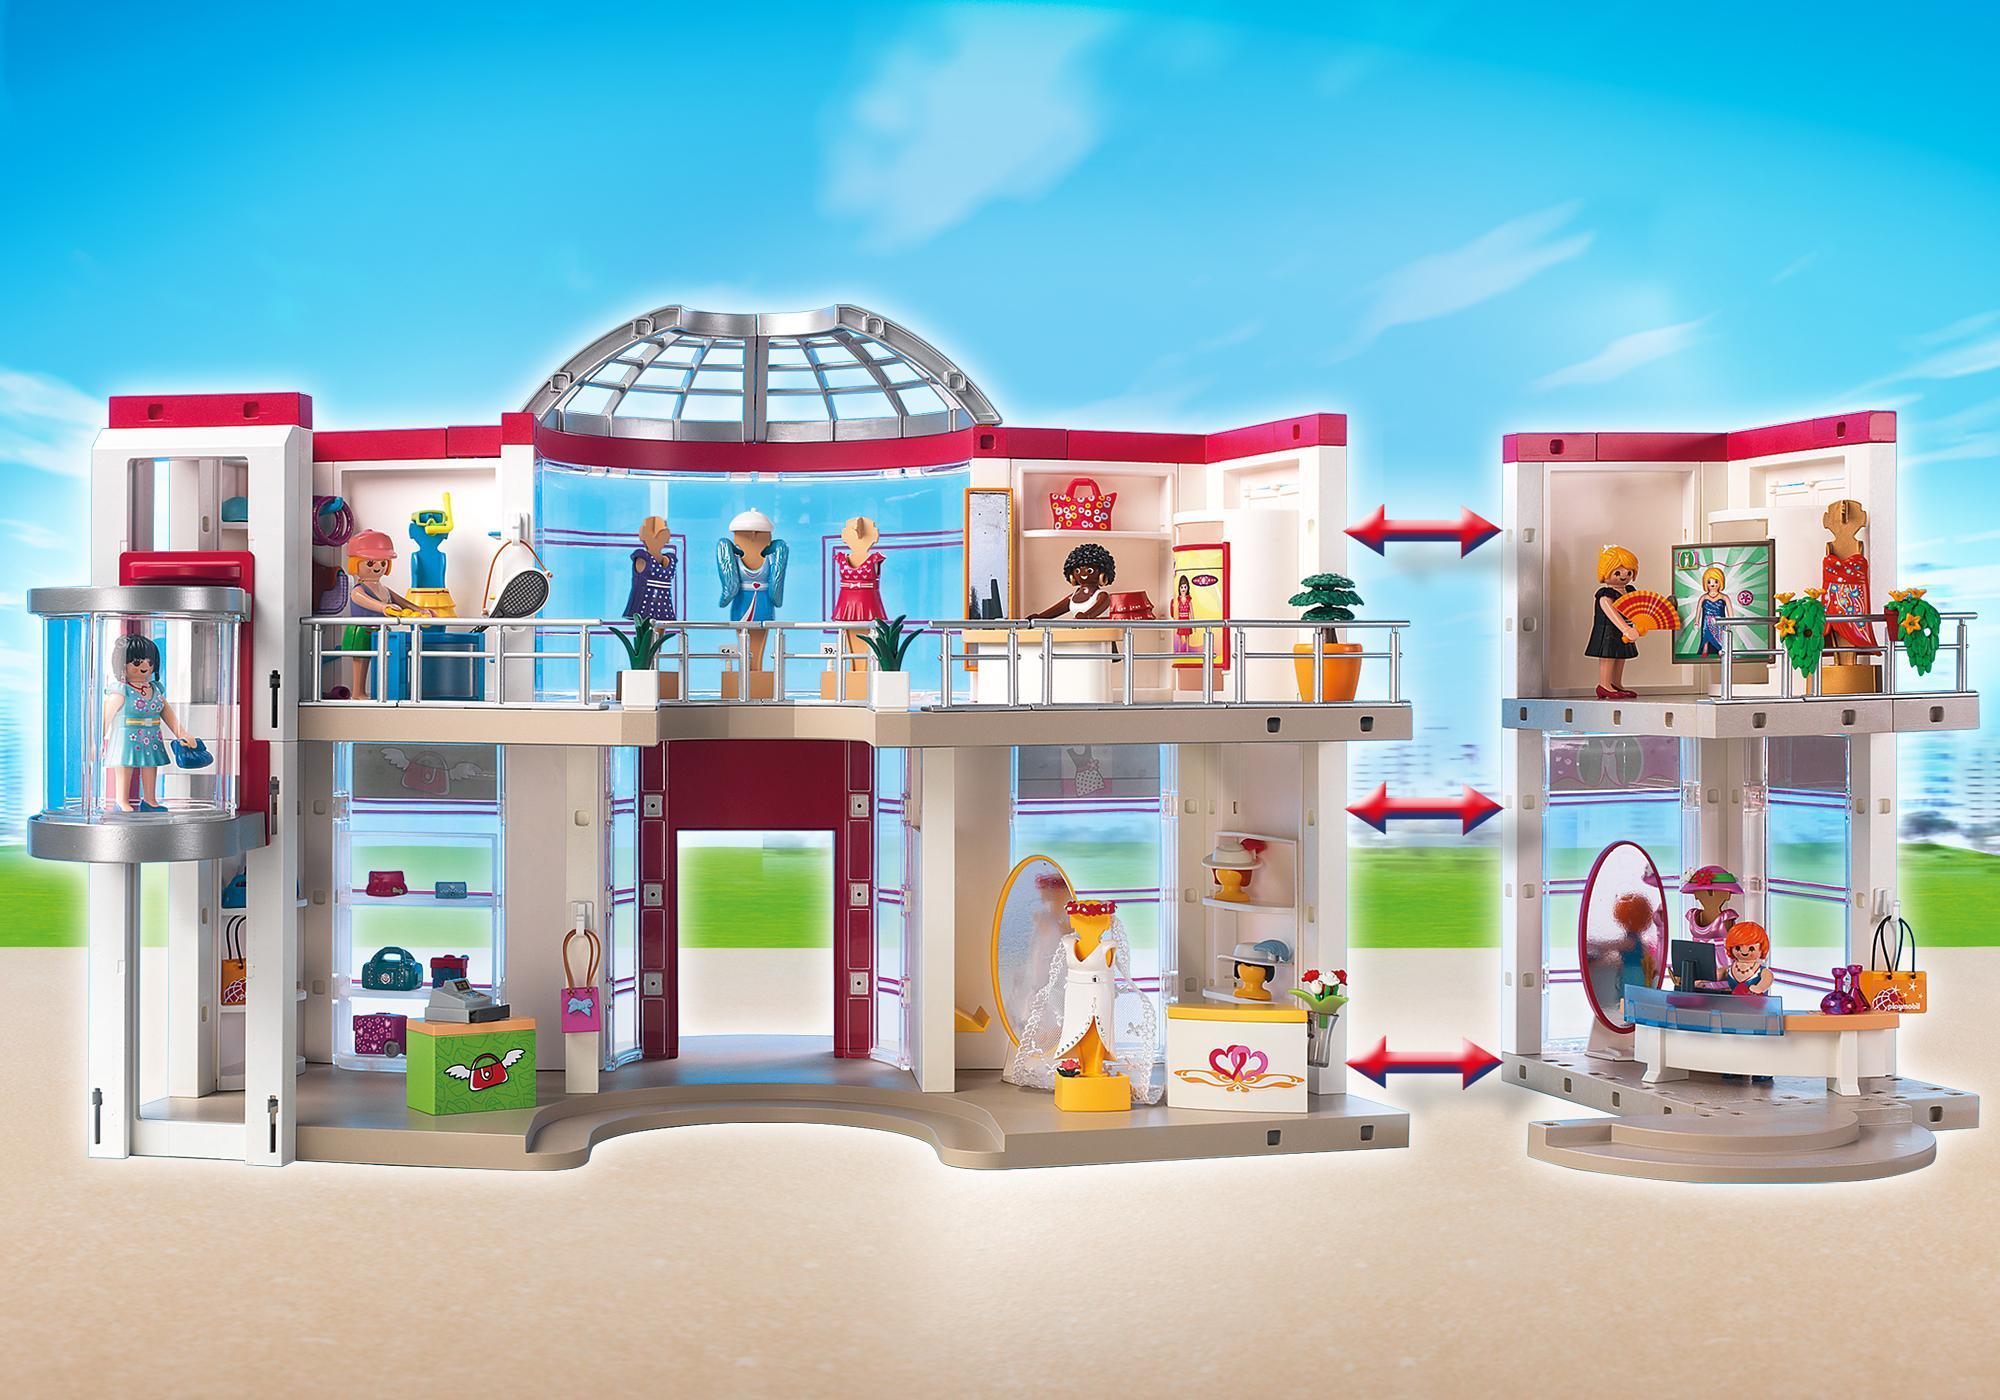 http://media.playmobil.com/i/playmobil/5485_product_extra6/Μεγάλο εμπορικό κέντρο